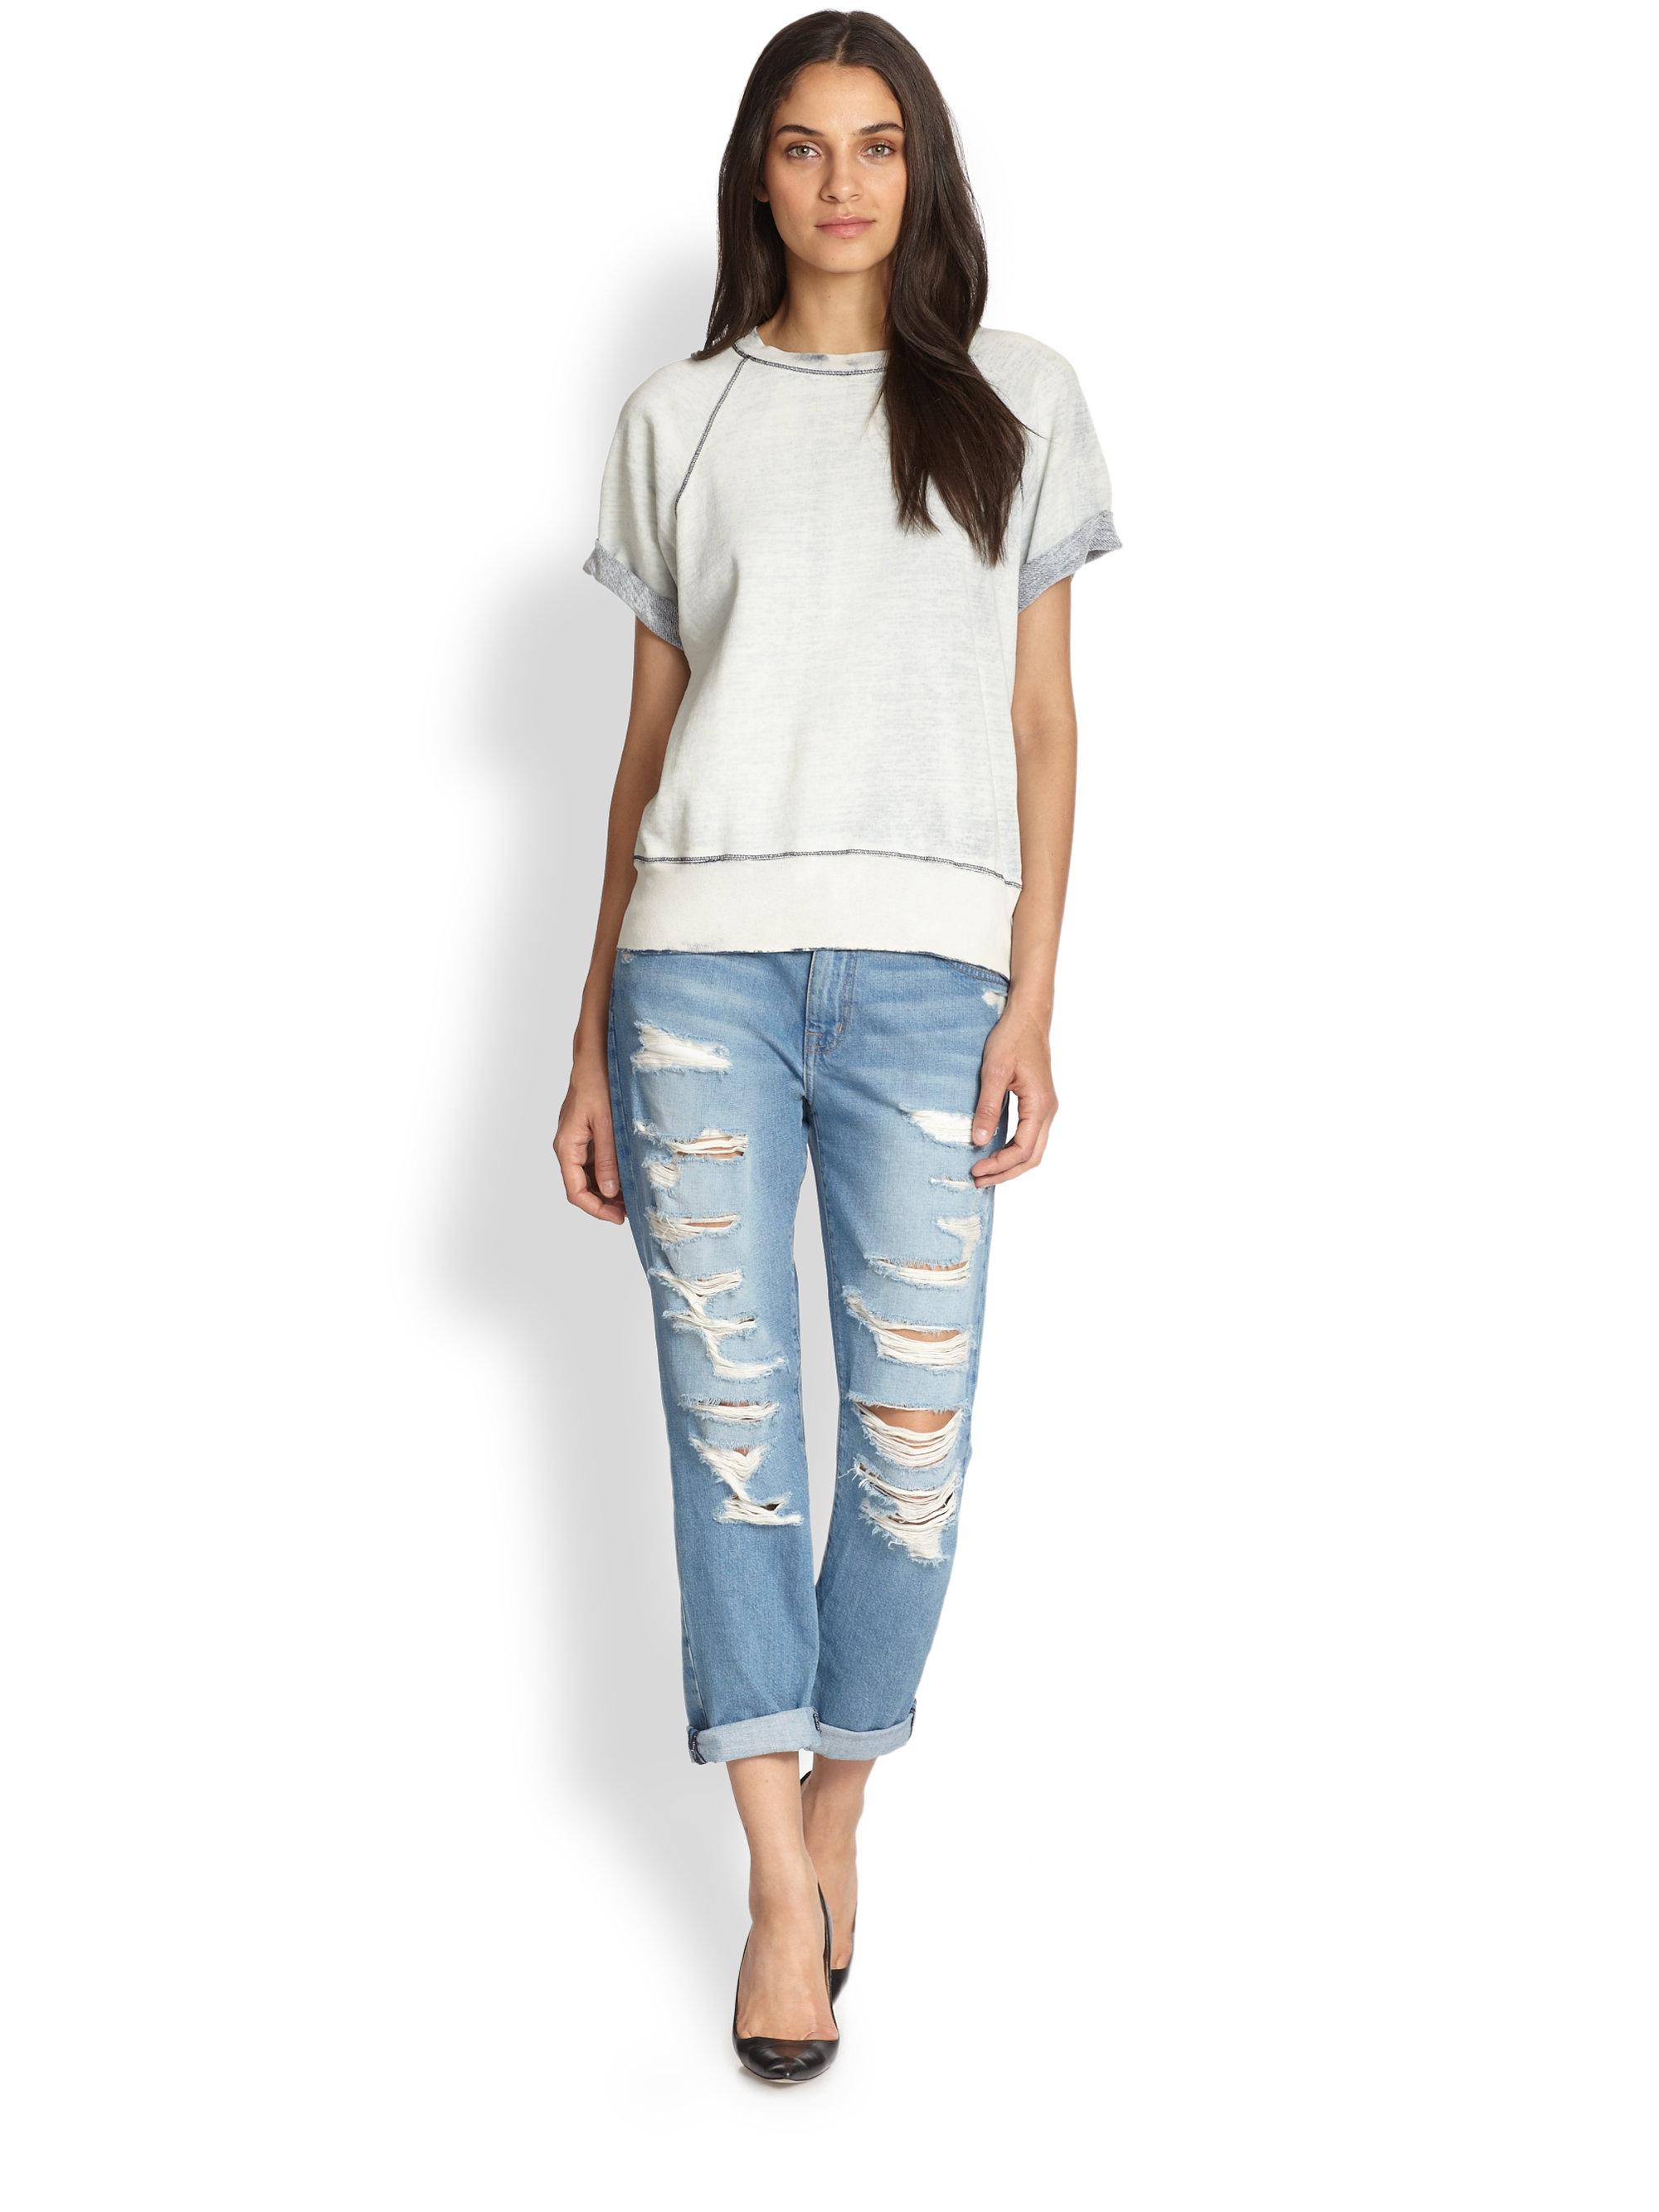 New Autumn Fashion Women39s Stretch Jeans Torn Boyfriends Slim Solid Women